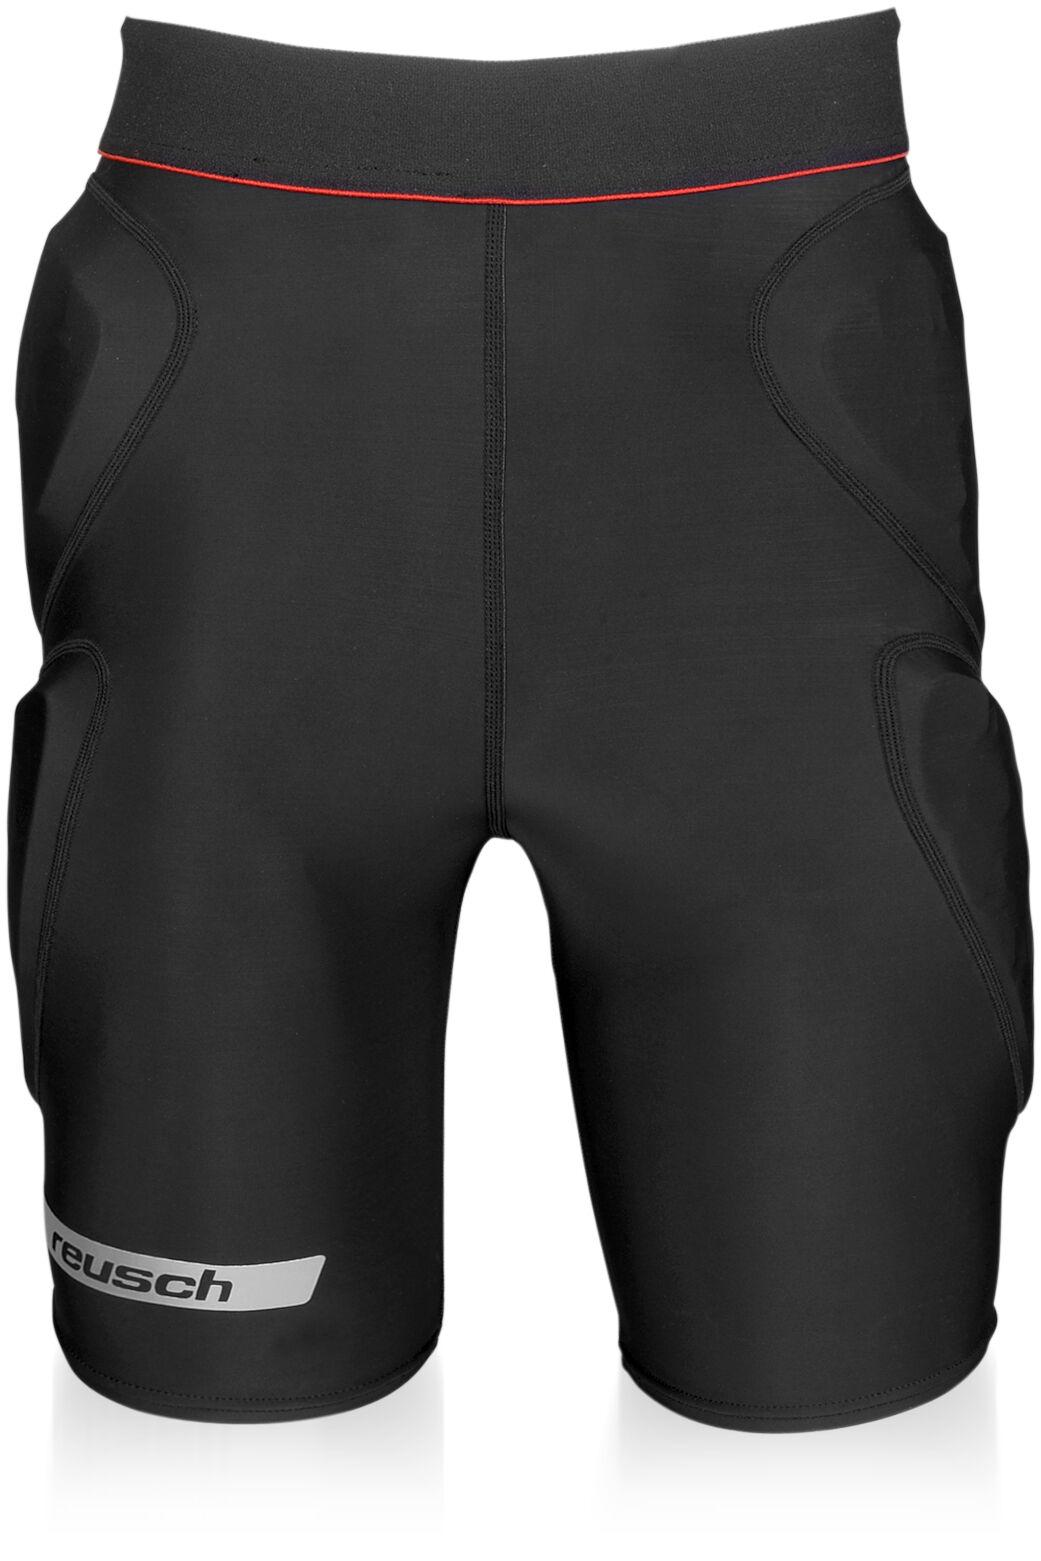 REUSCH CS SHORT Padded Pantaloncini Bermuda Portiere MMS Compression imbottiture